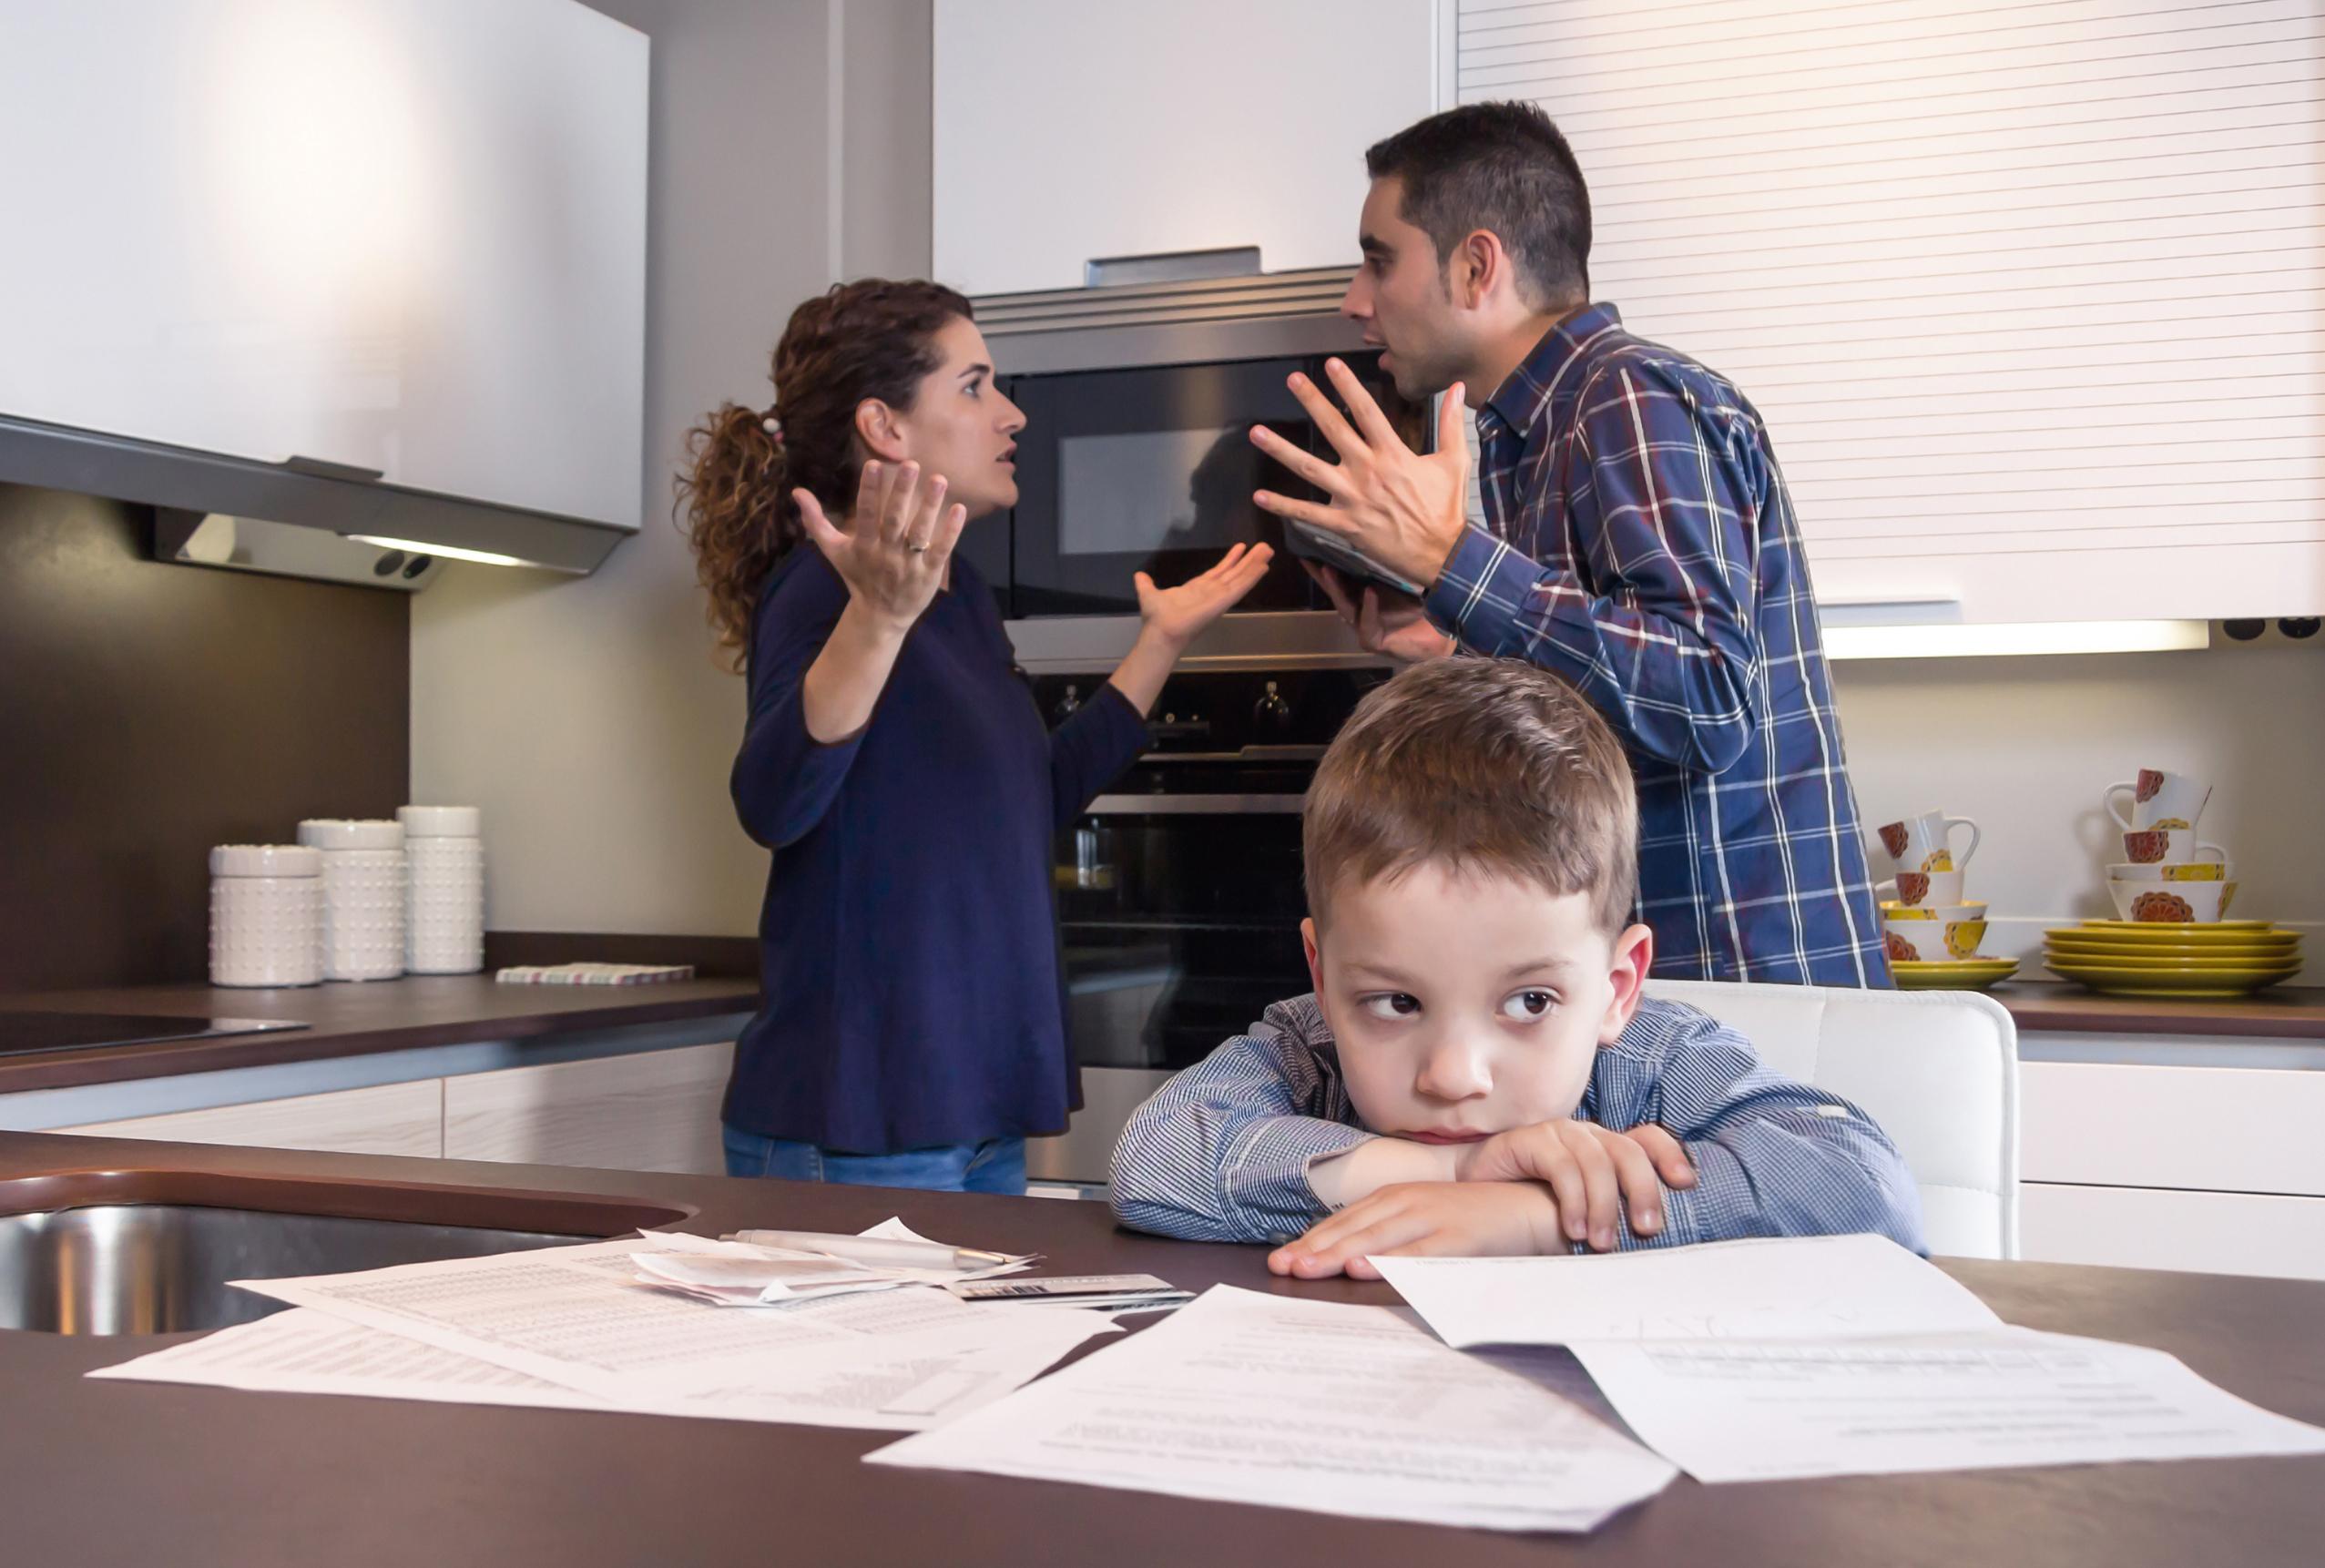 Parental conflict